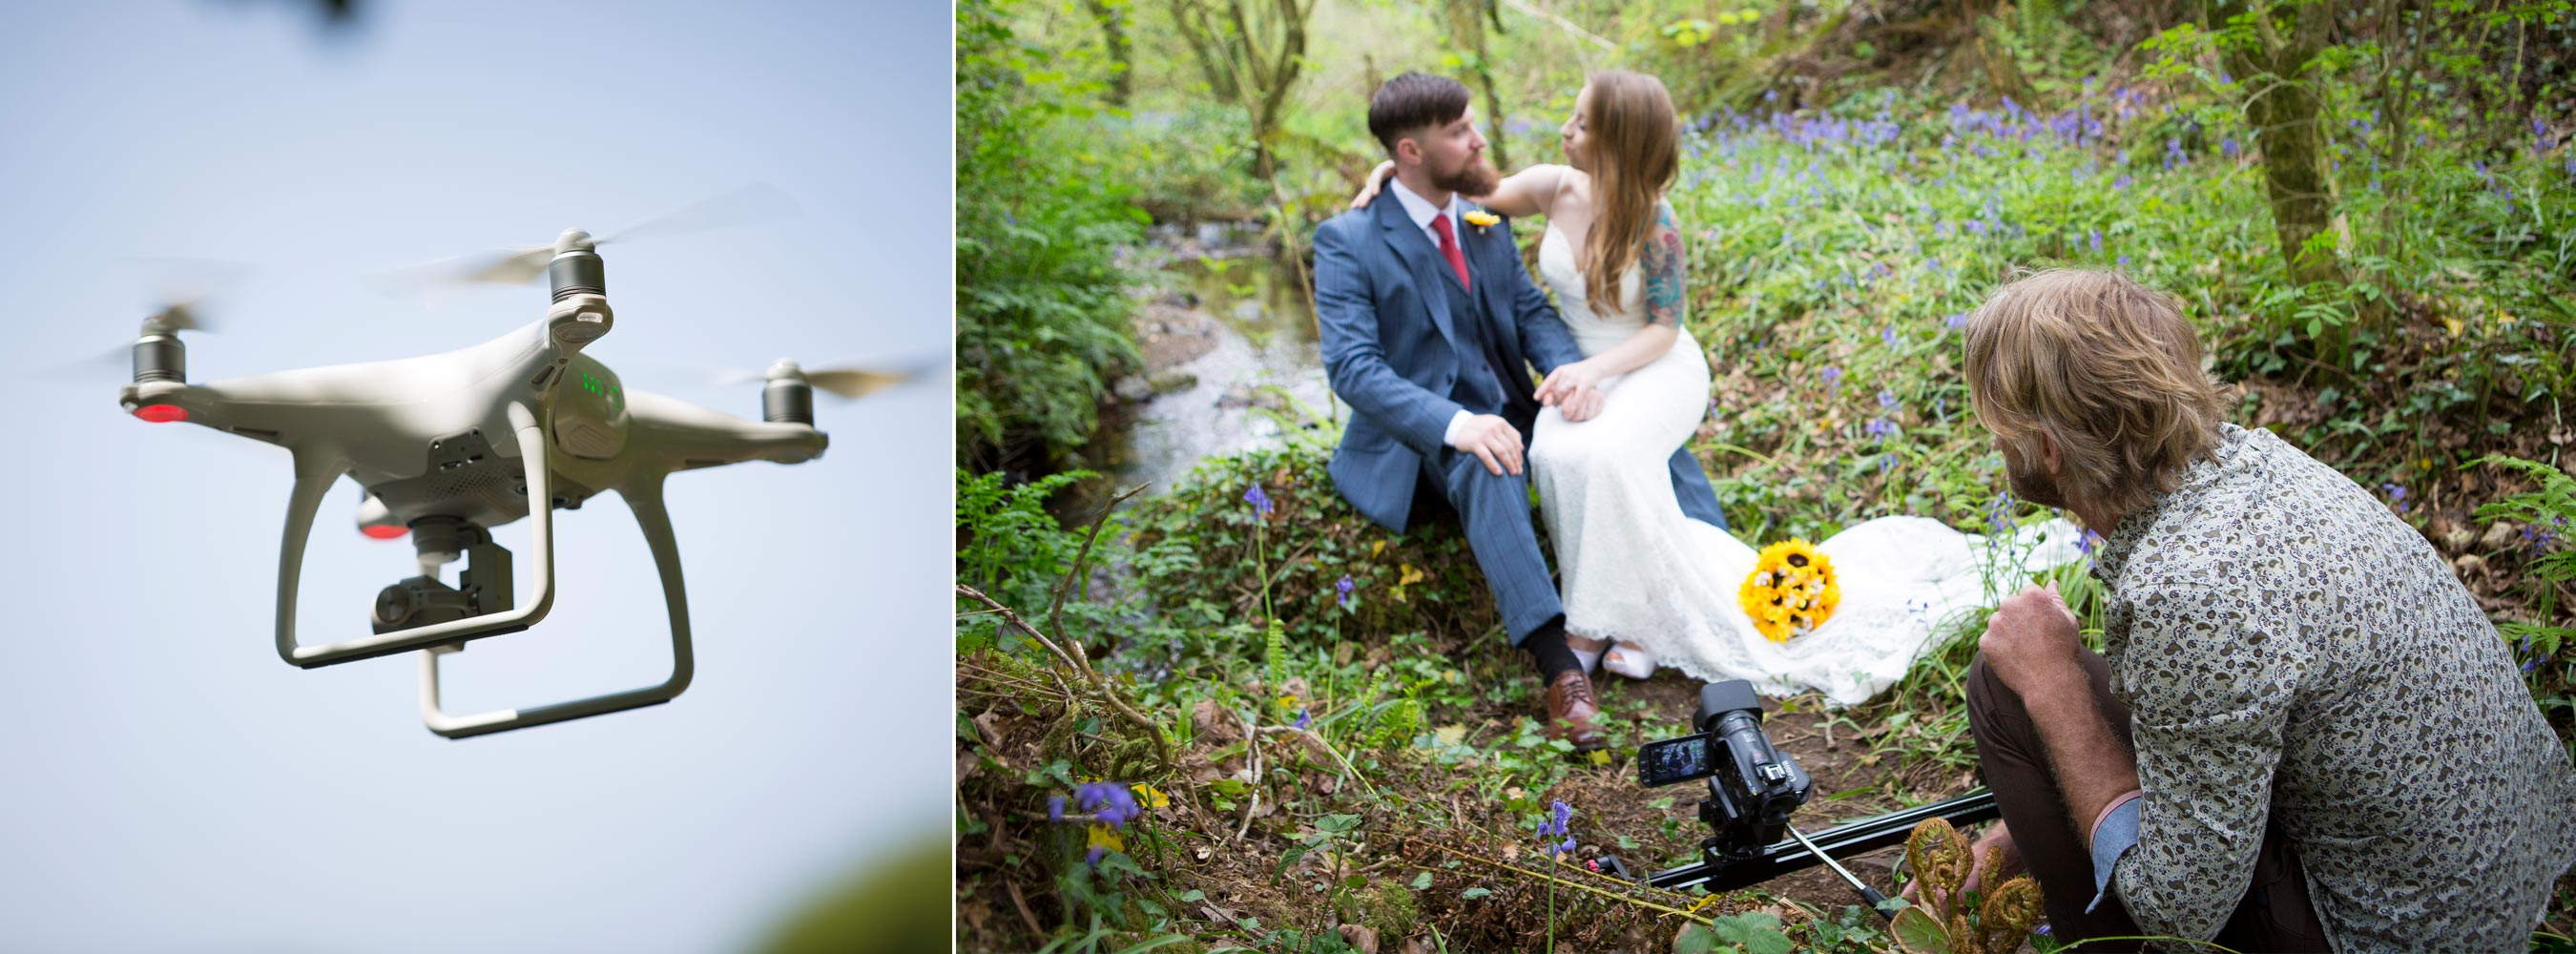 Film Making Drone Videographer